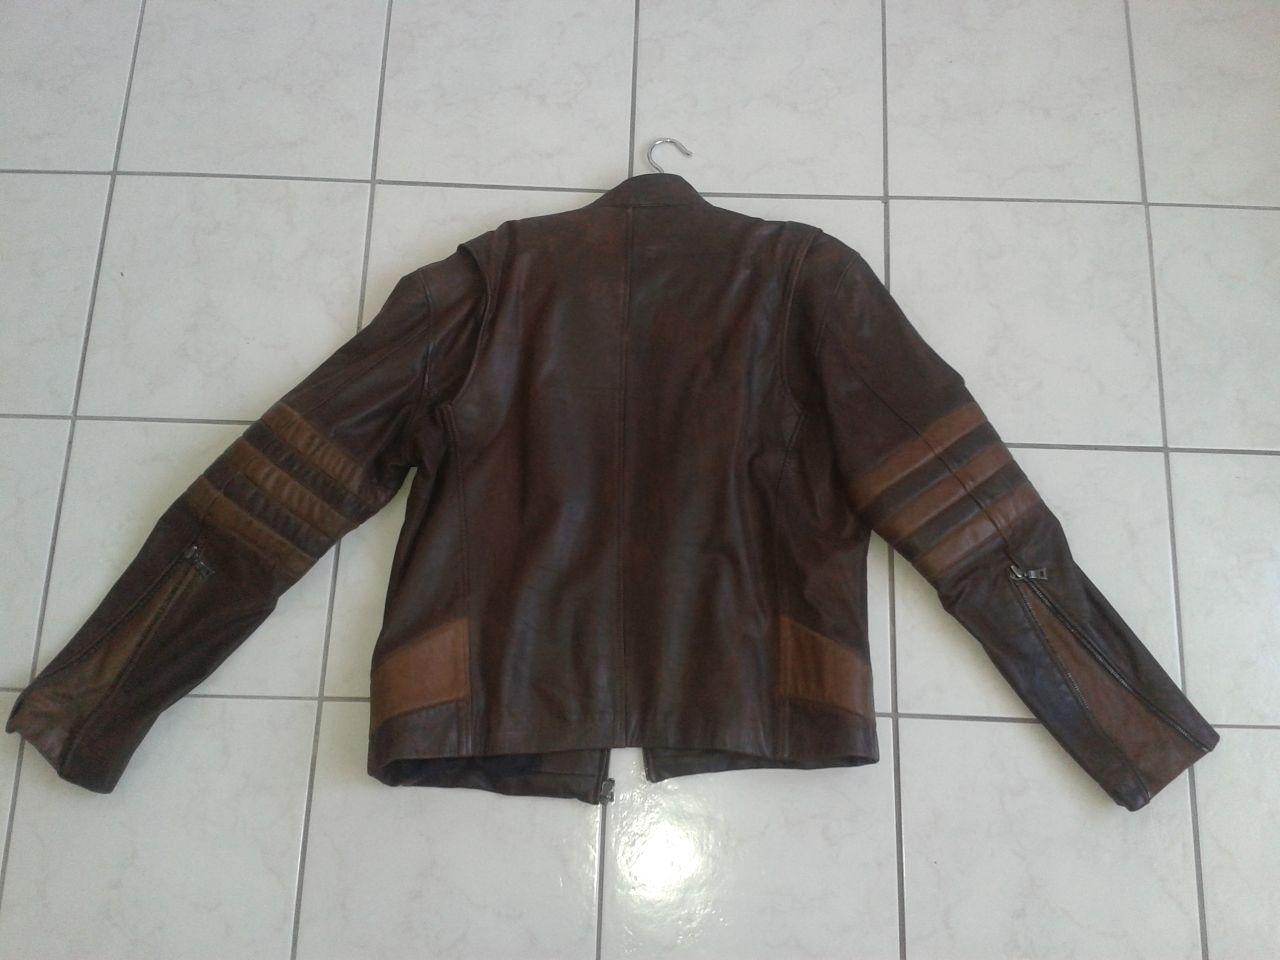 Using Black Shoe Polish On A Leather Jacket Videos